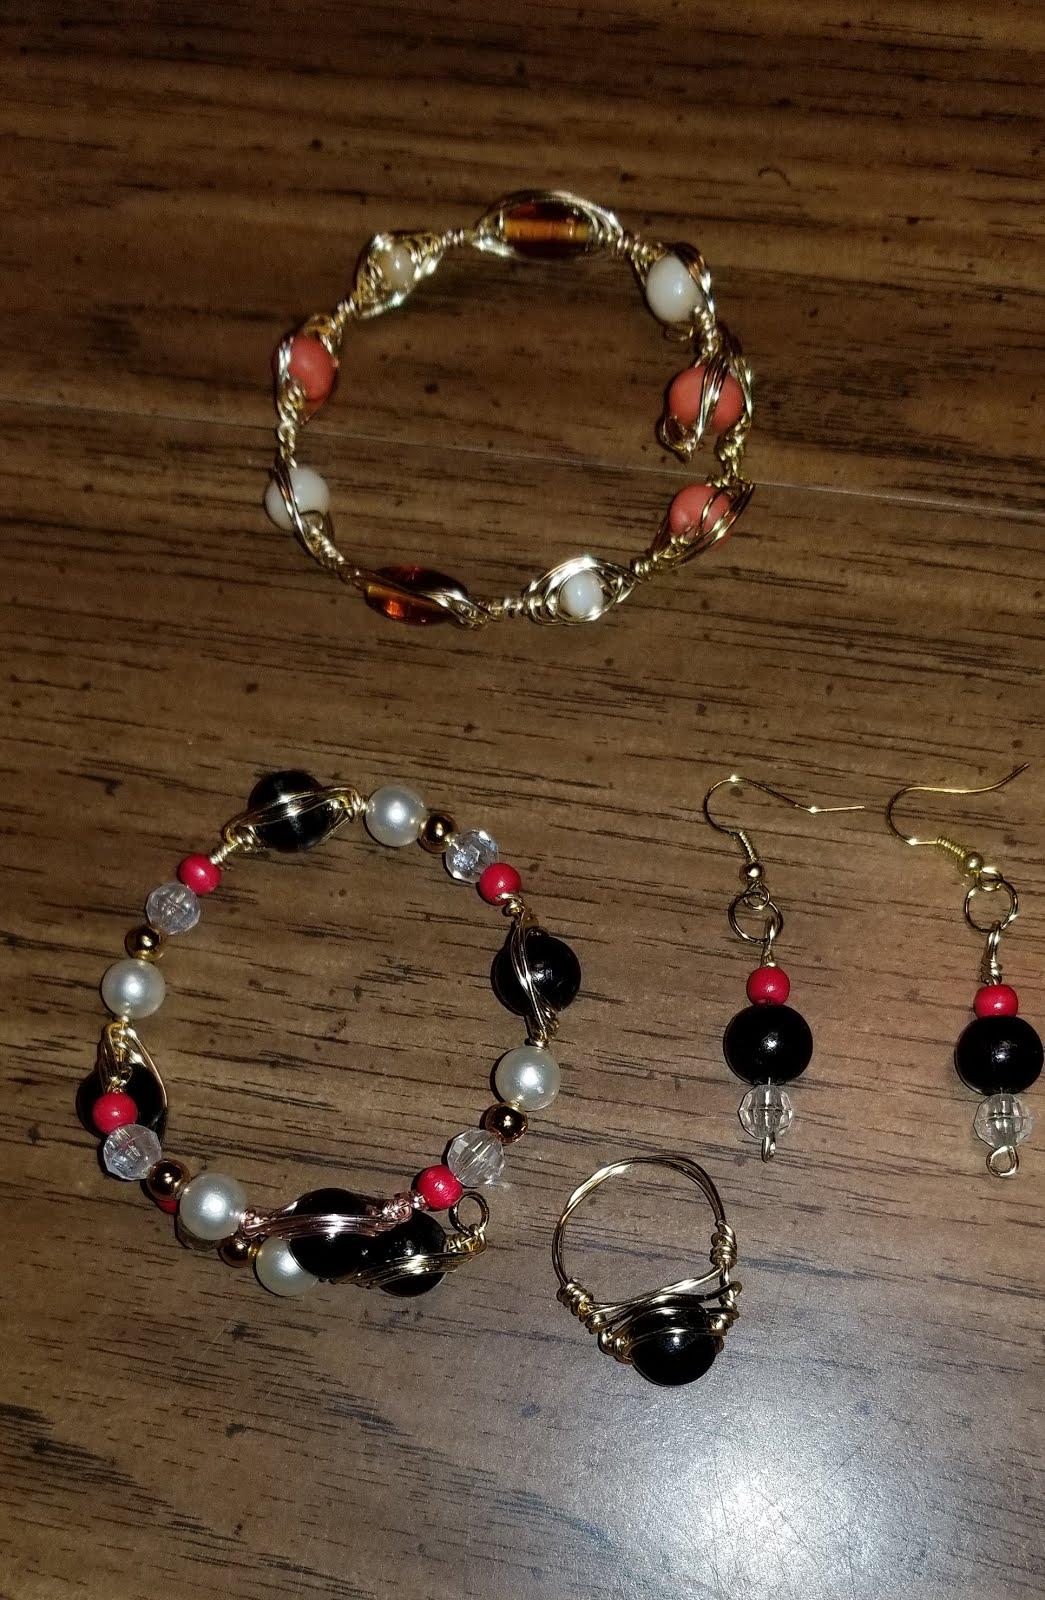 Jewelry I made